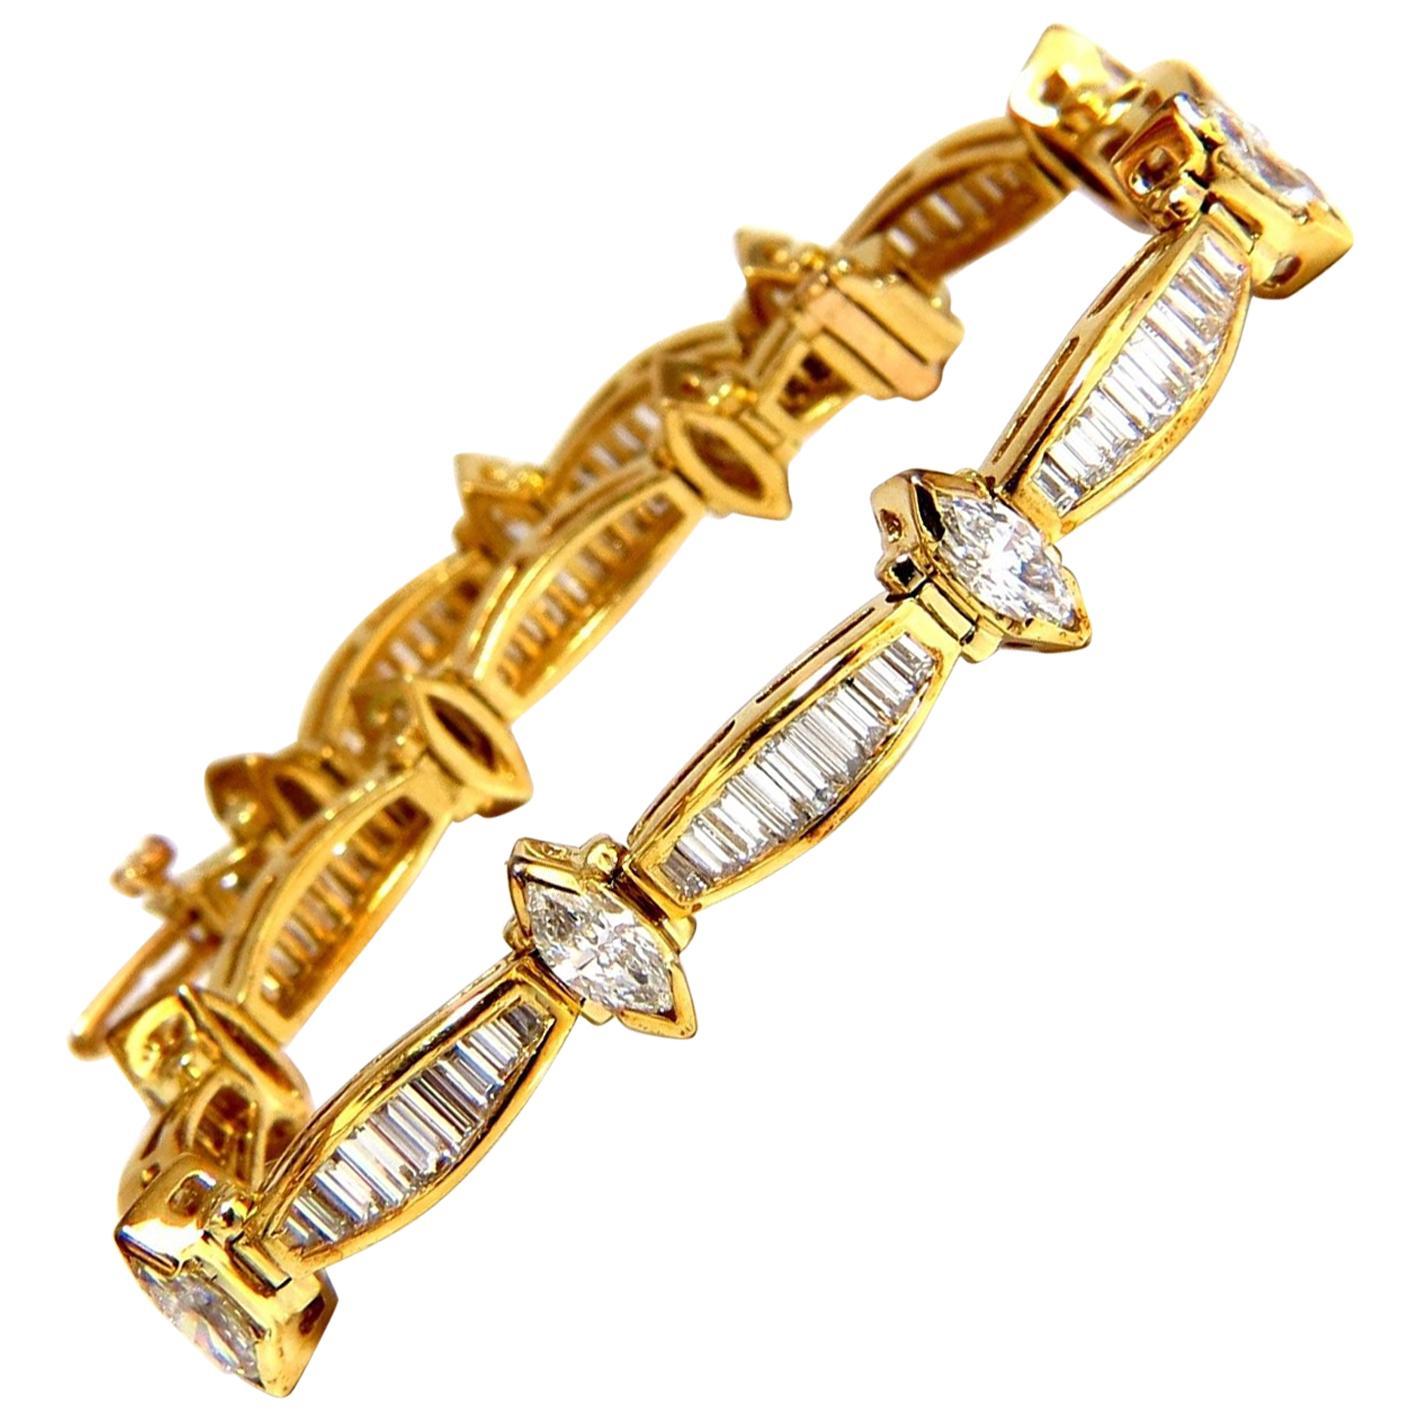 6.00 Carat Baguettes Marquise Diamond Tennis Bracelet 18 Karat G/Vs